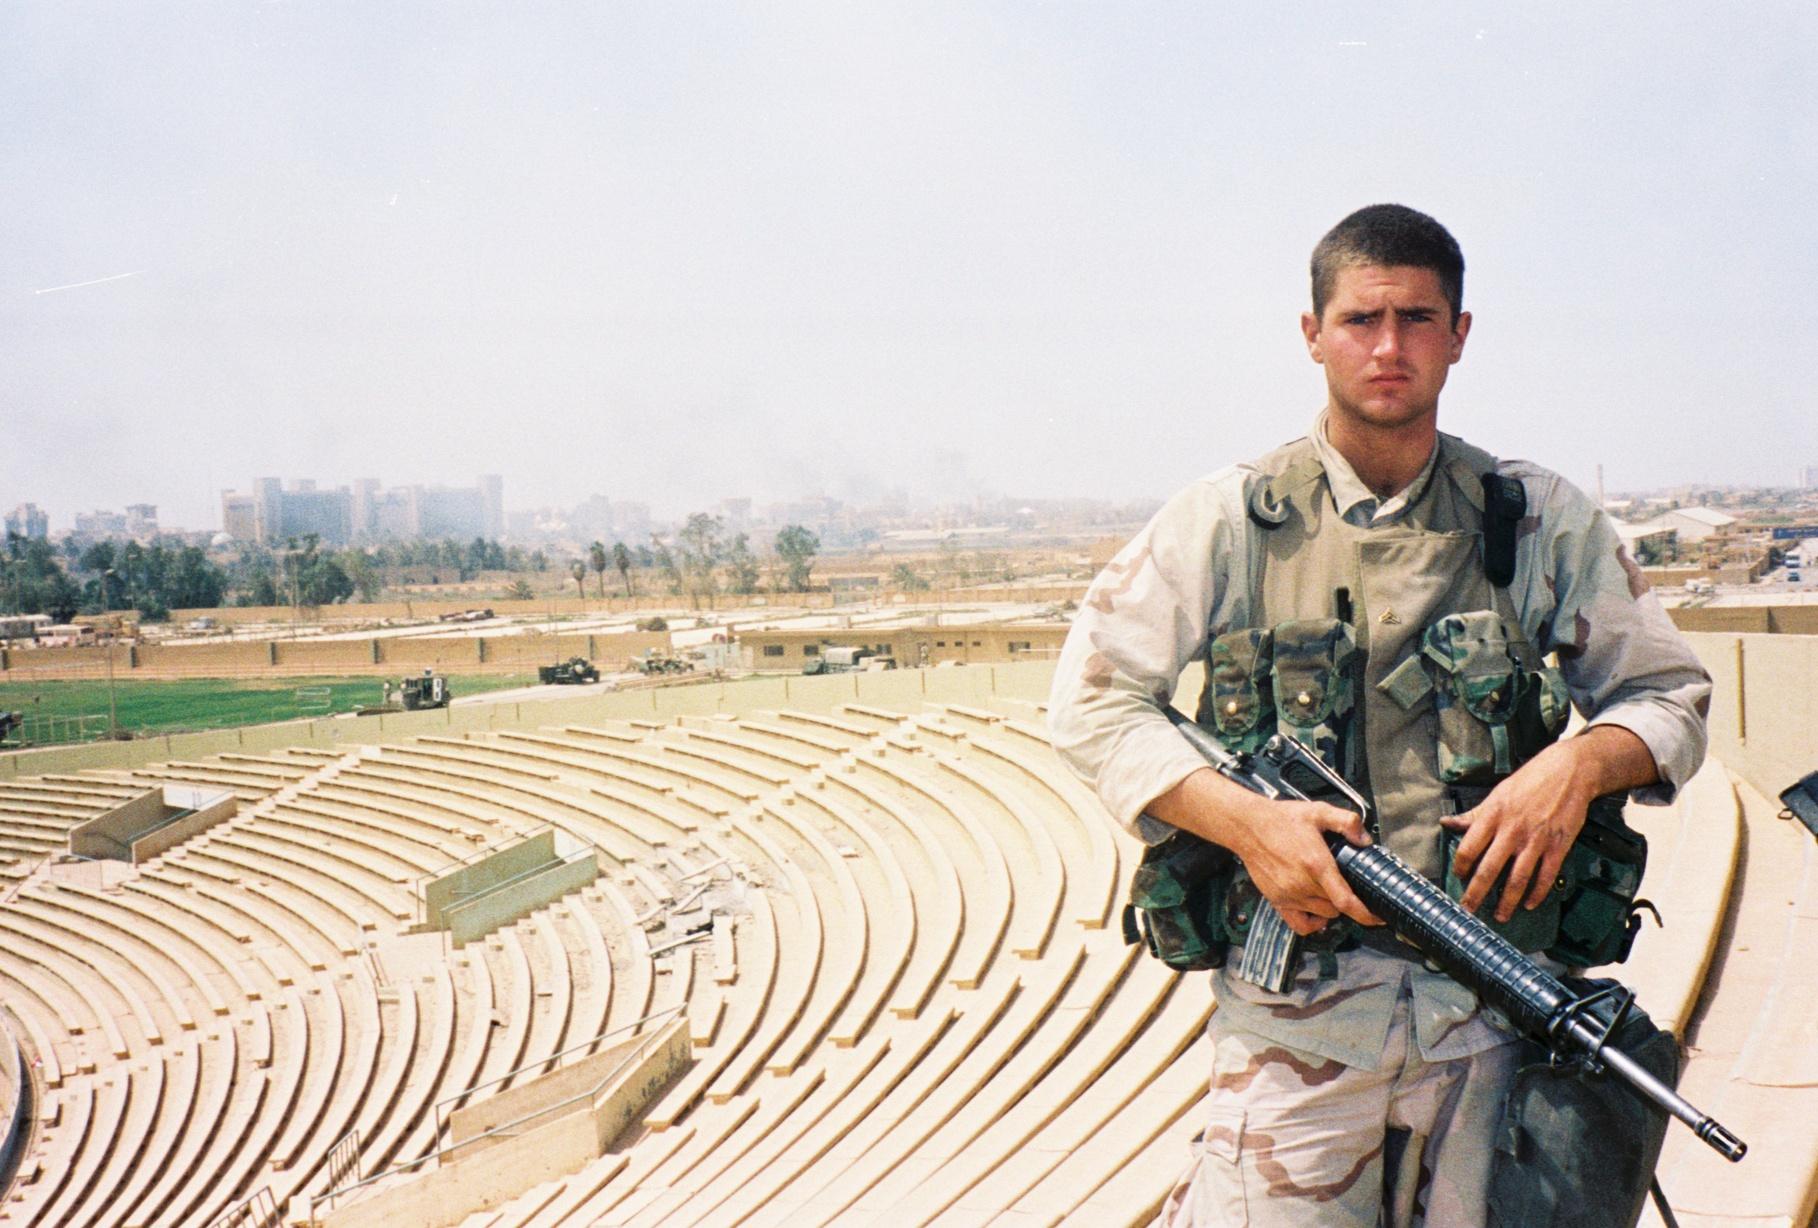 April 2003: Tyson in Baghdad